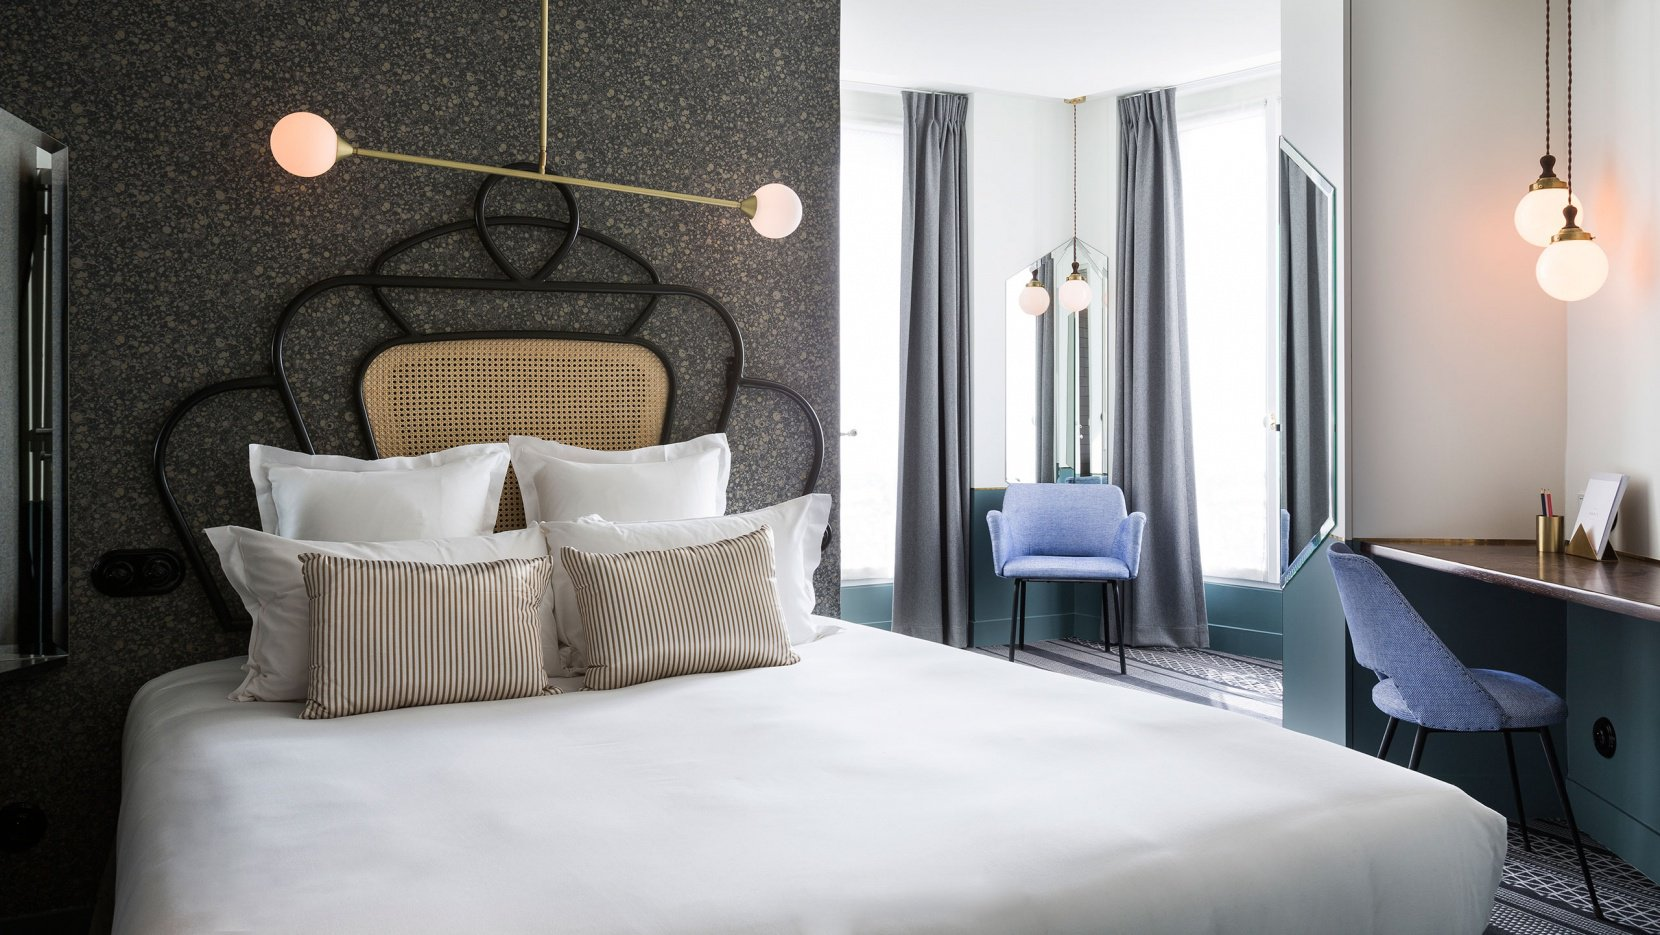 p1_hotel_panache_paris_yatzer